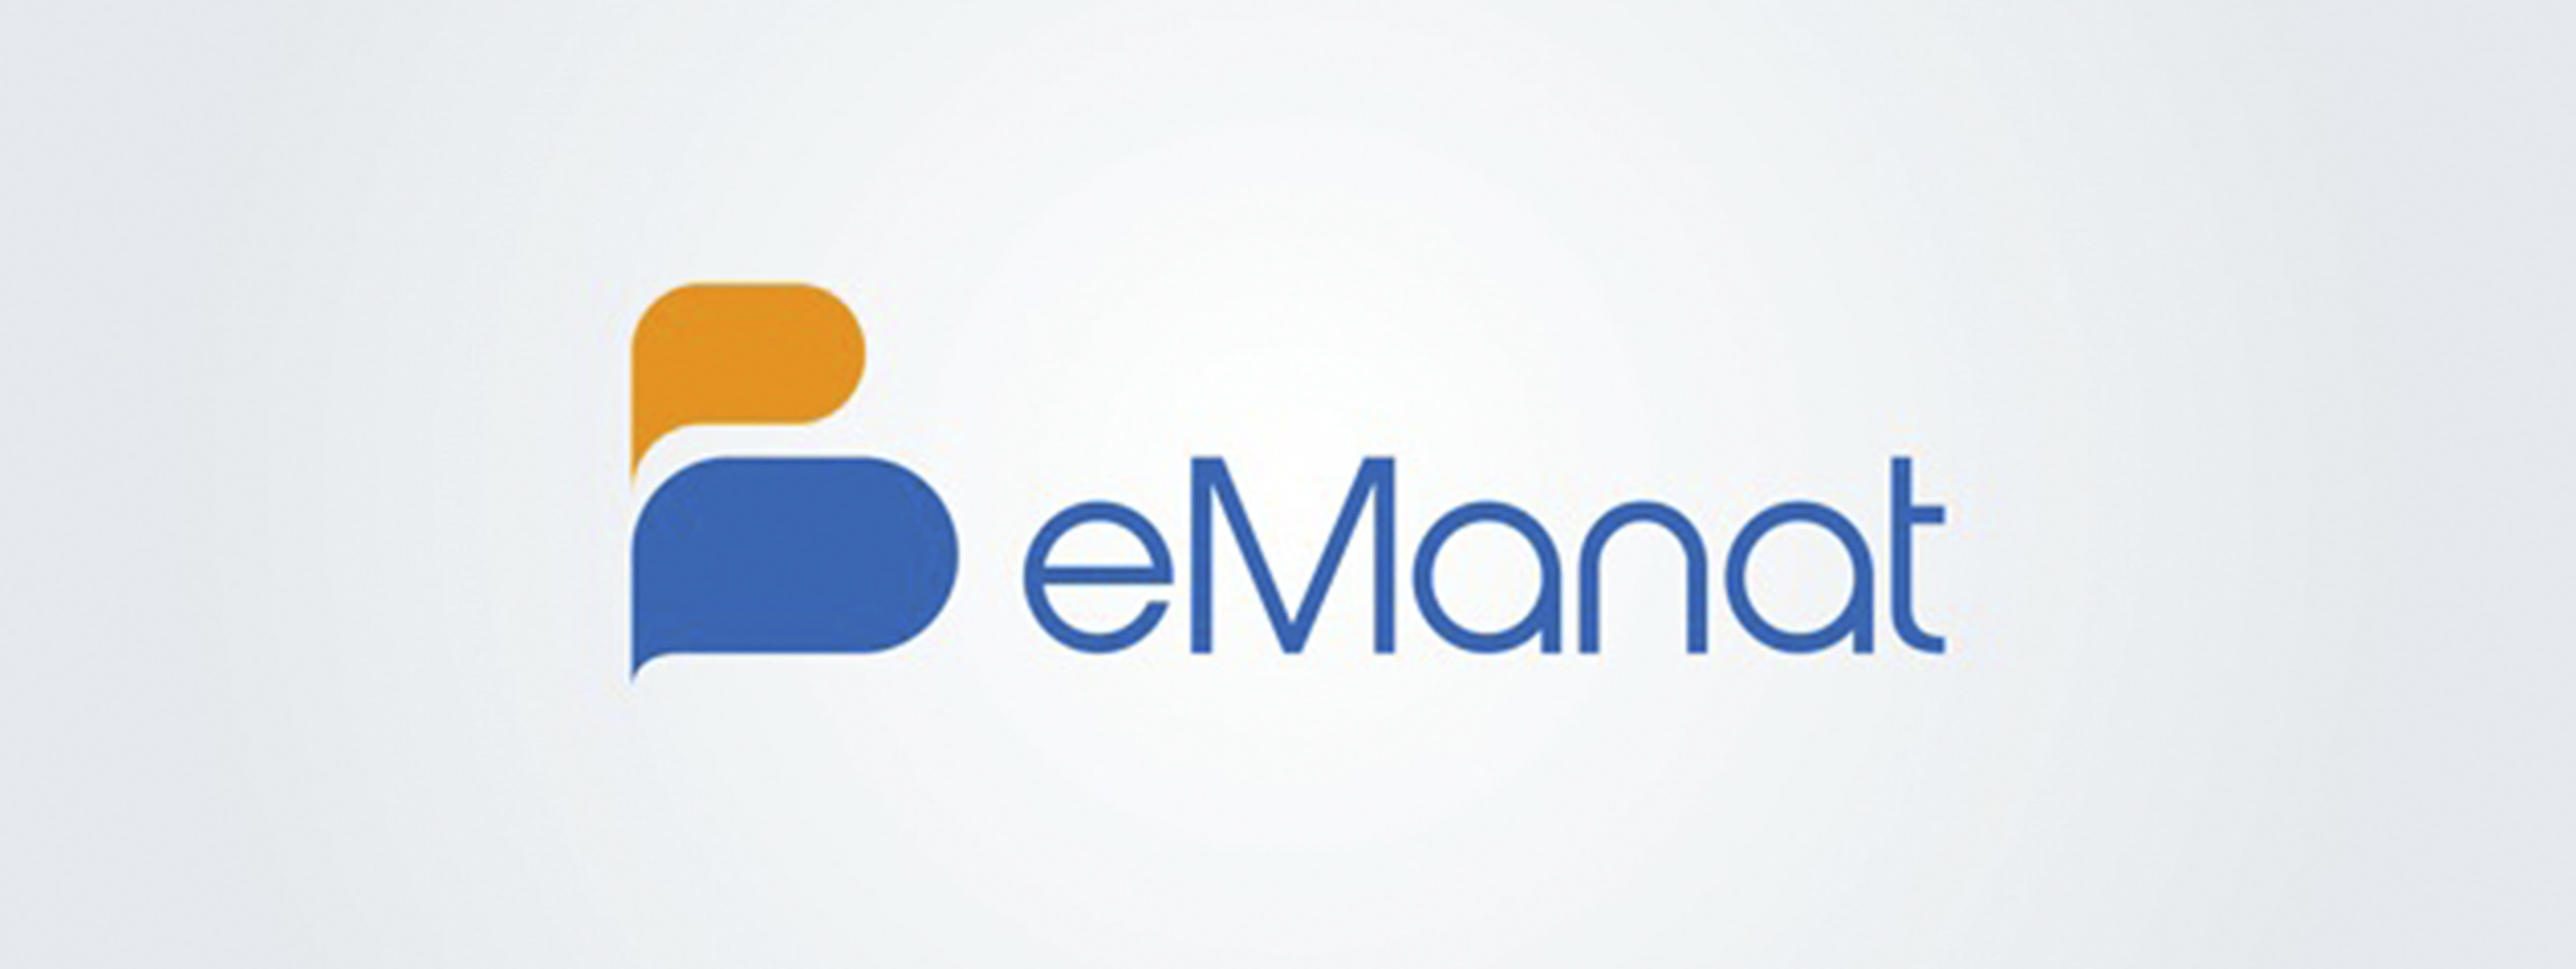 eManat